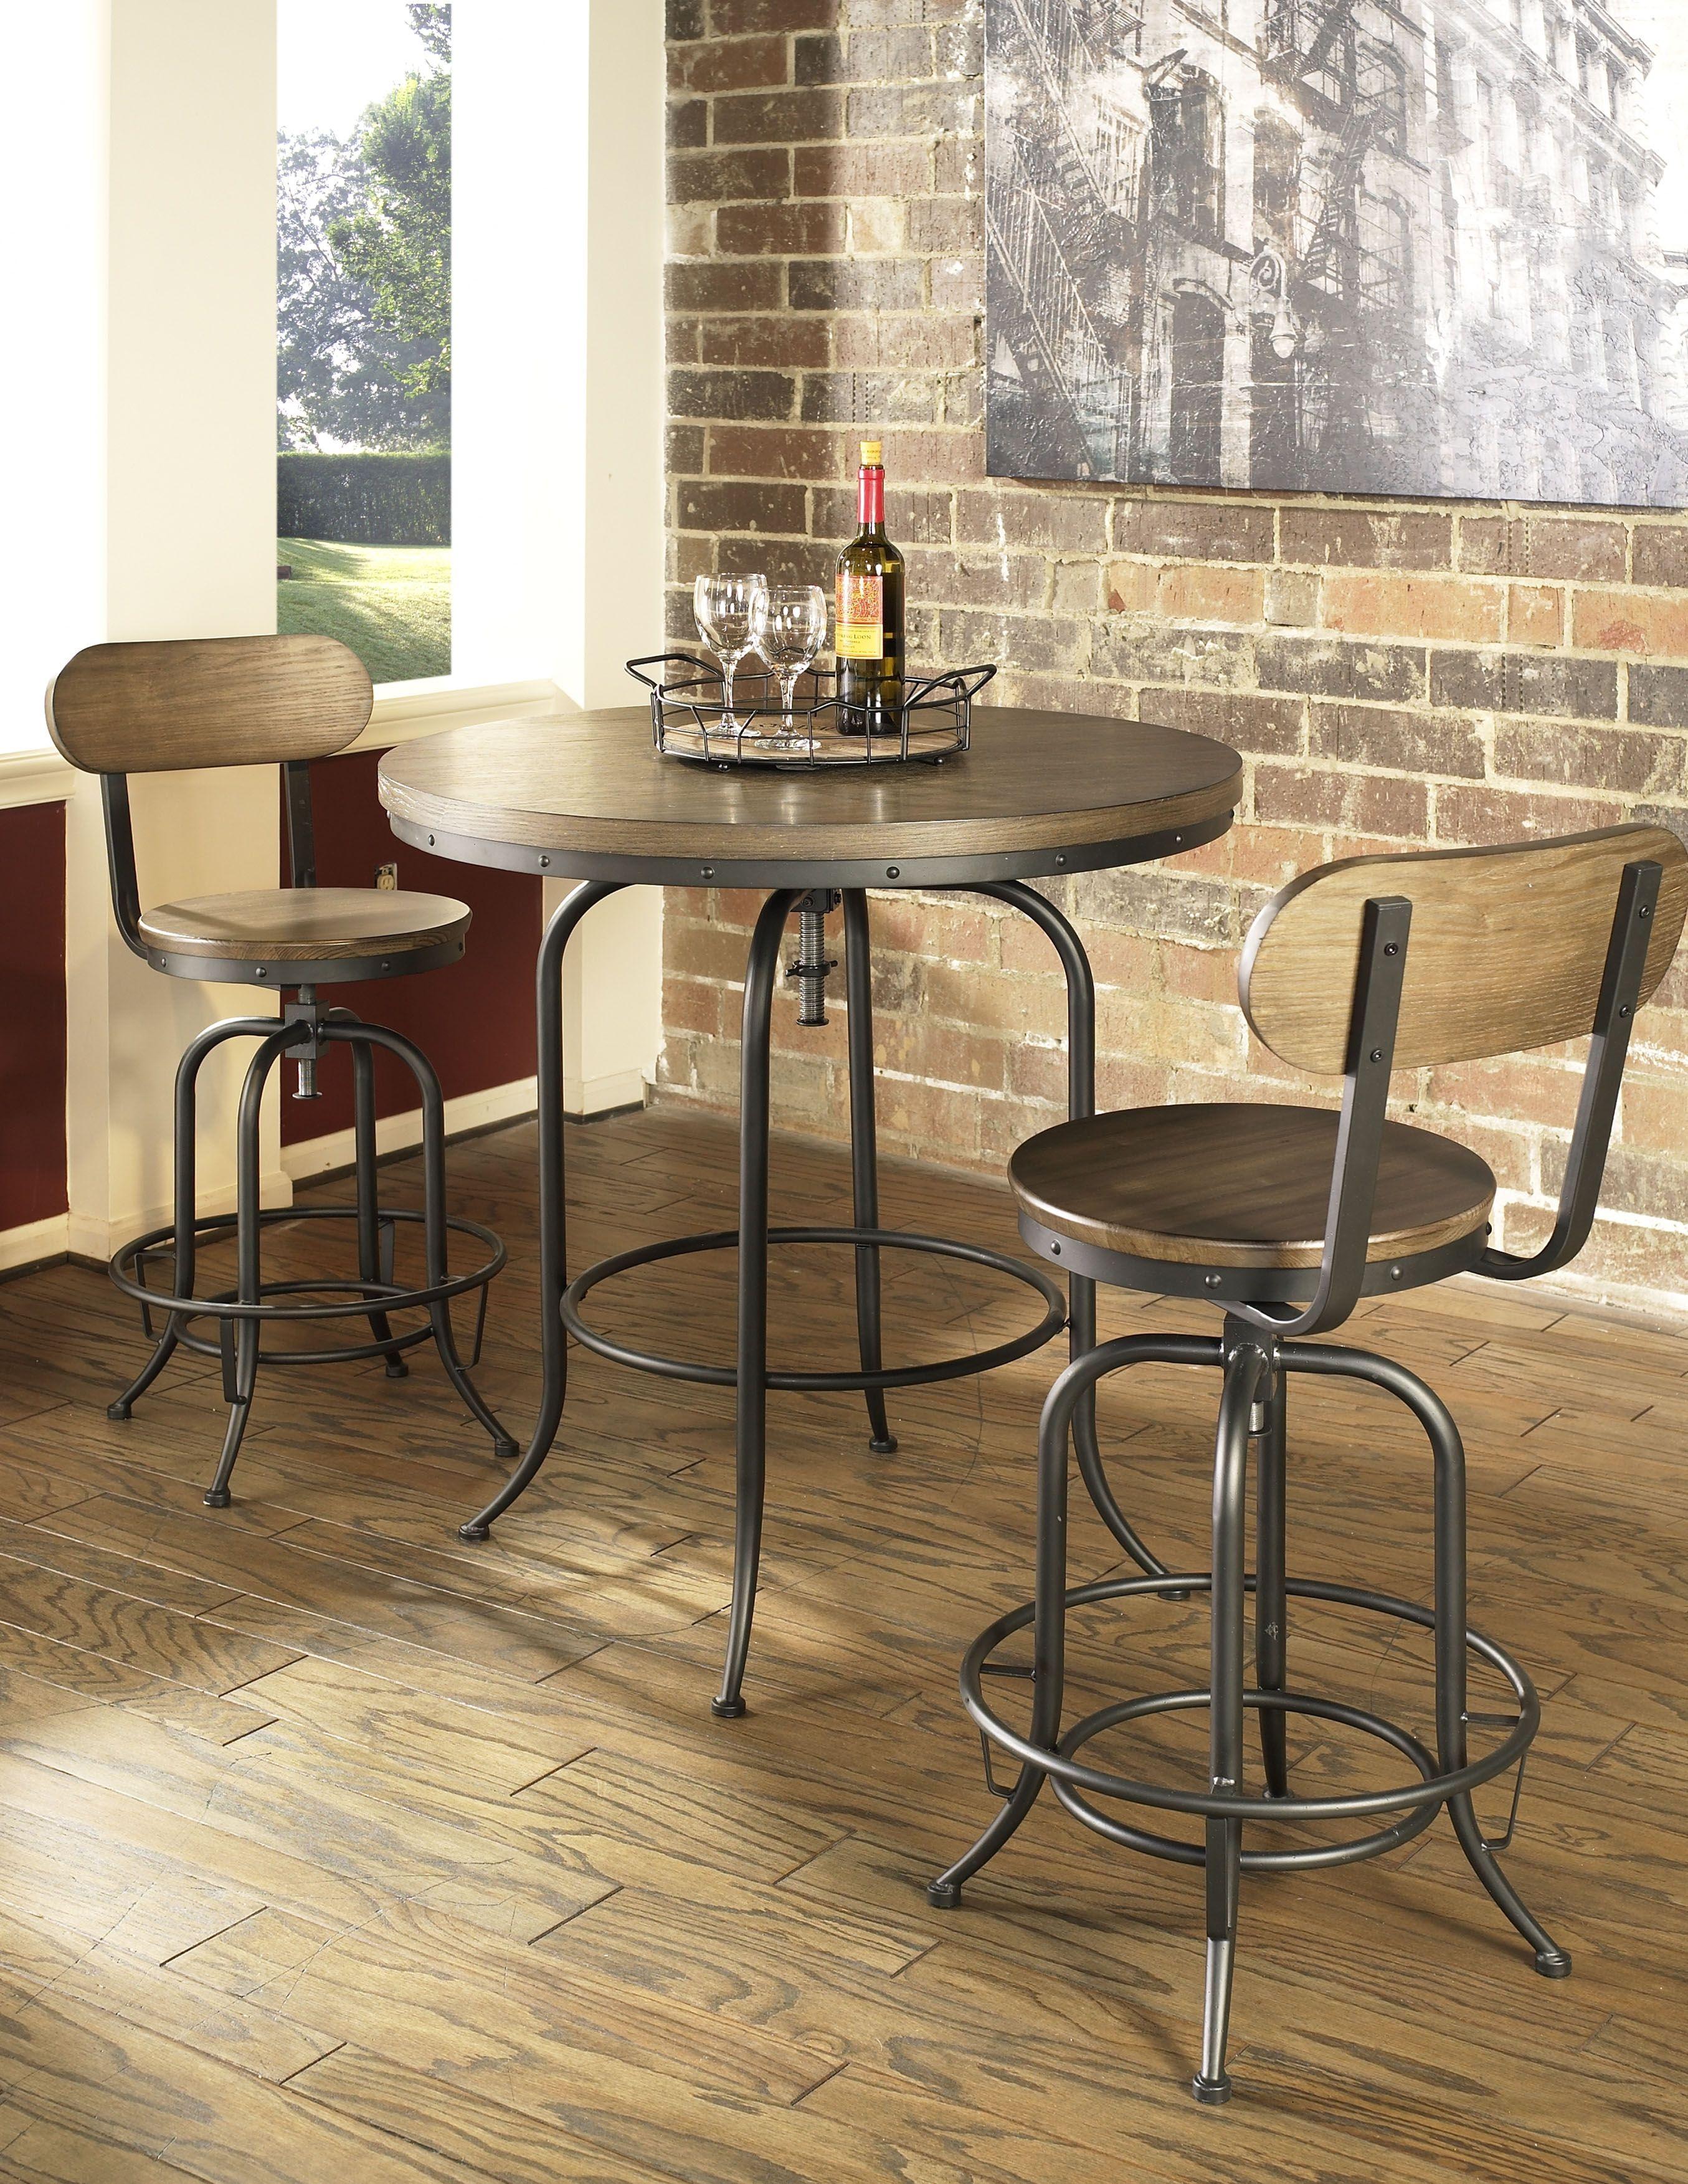 New Castle Round Bar Table Bar Table Round Bar Table Rustic Round Table Tall round bar table